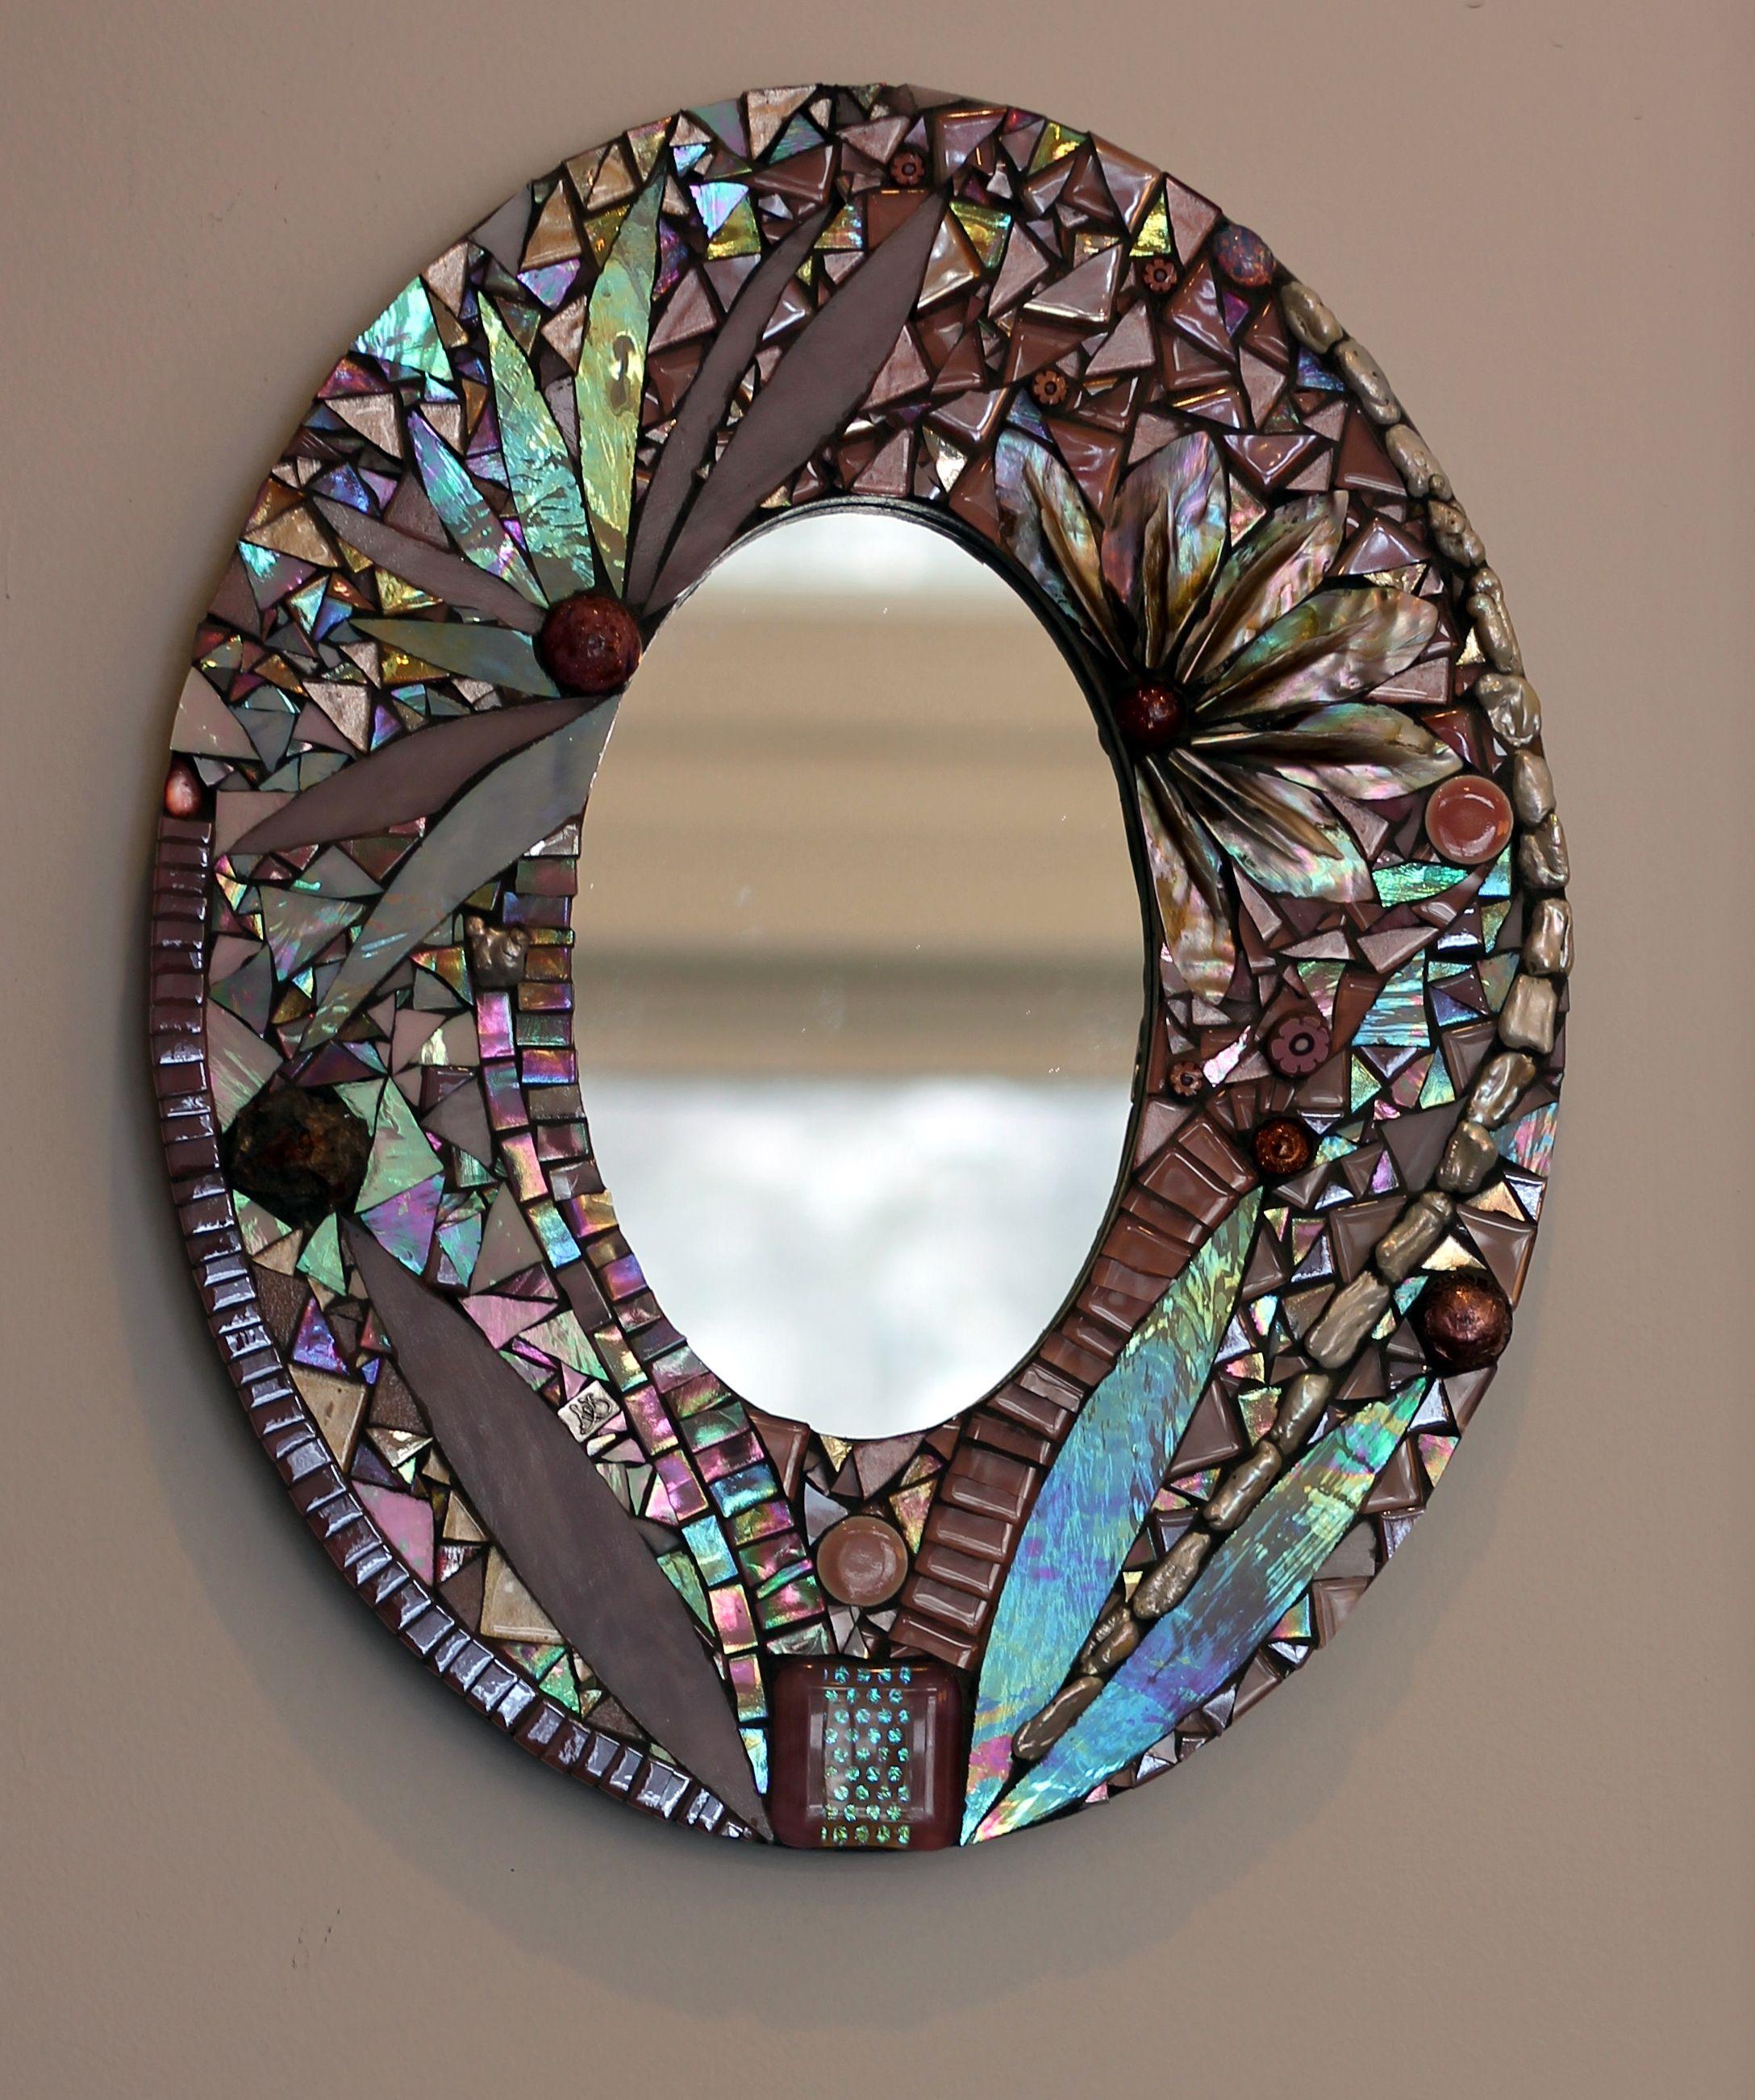 42+ Art and craft mirror tiles ideas